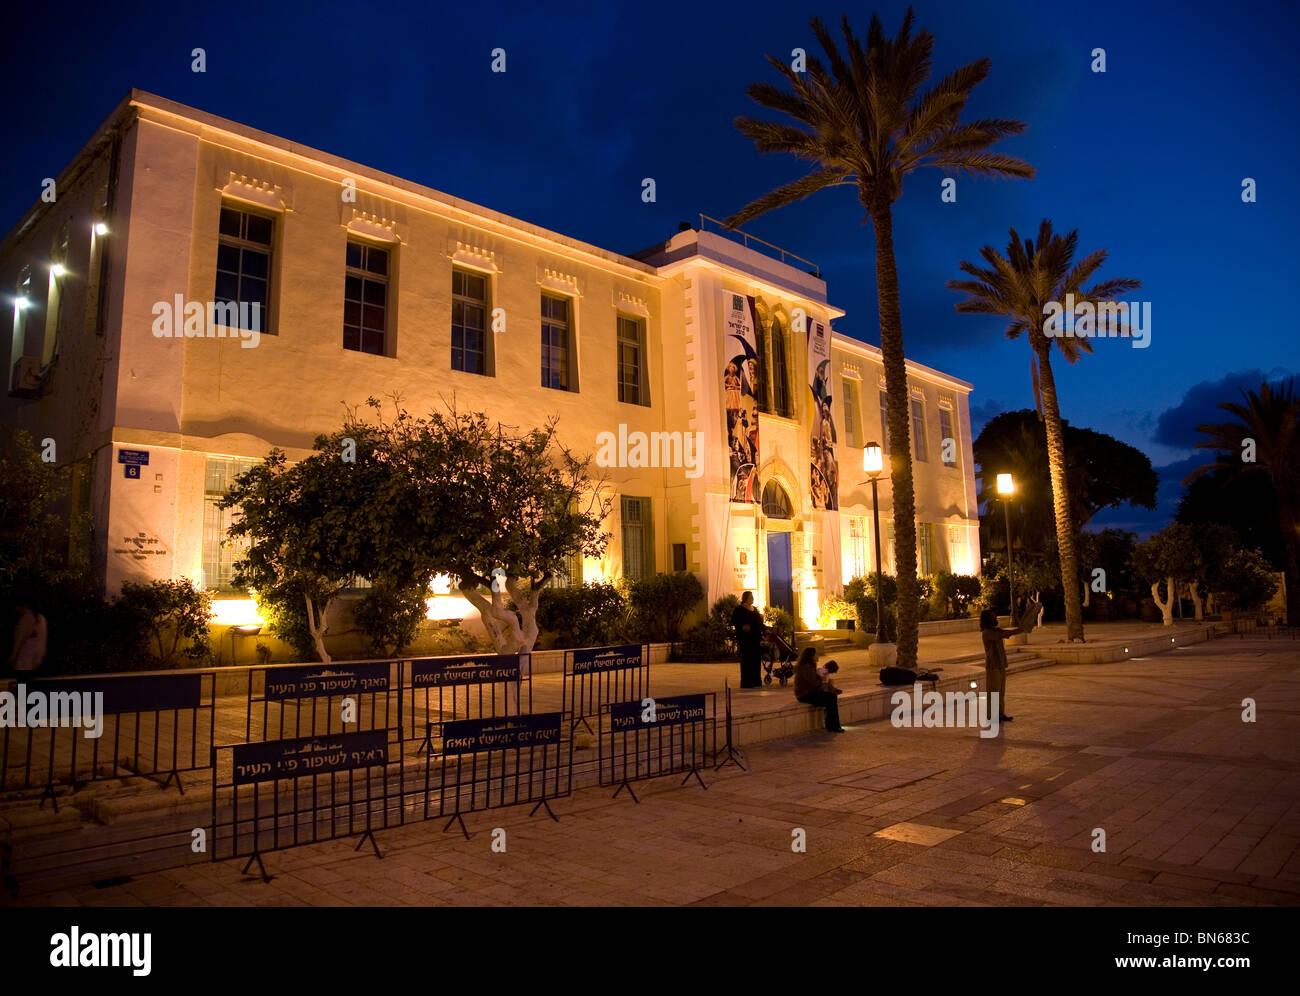 Yaron Yerushalmi  Hall - Susan Delal Cultural Centre in Neve Tzedek area, Tel Aviv - Stock Image